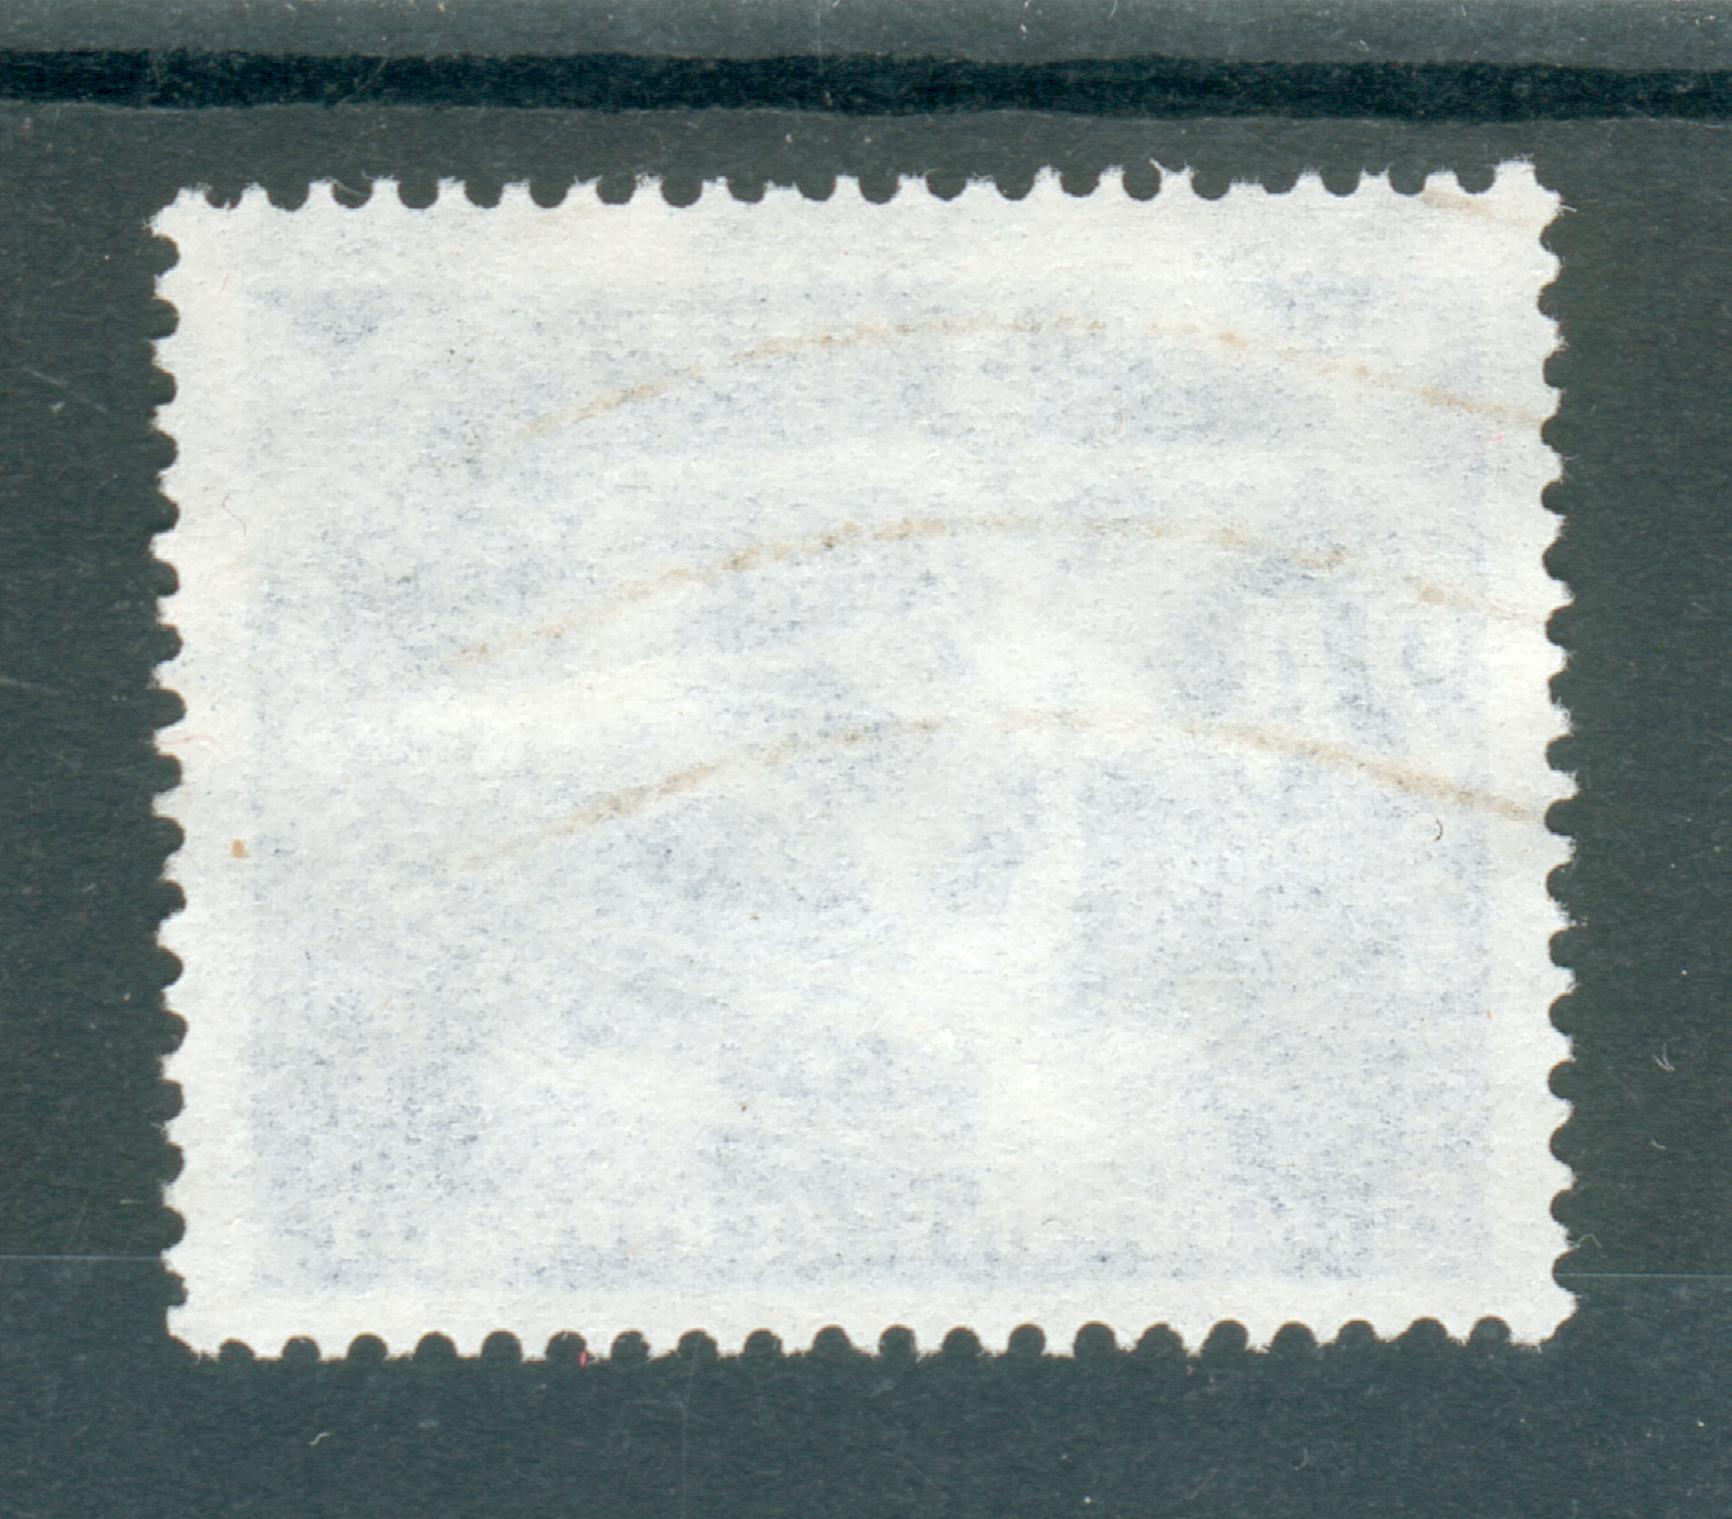 iy82-2.jpg